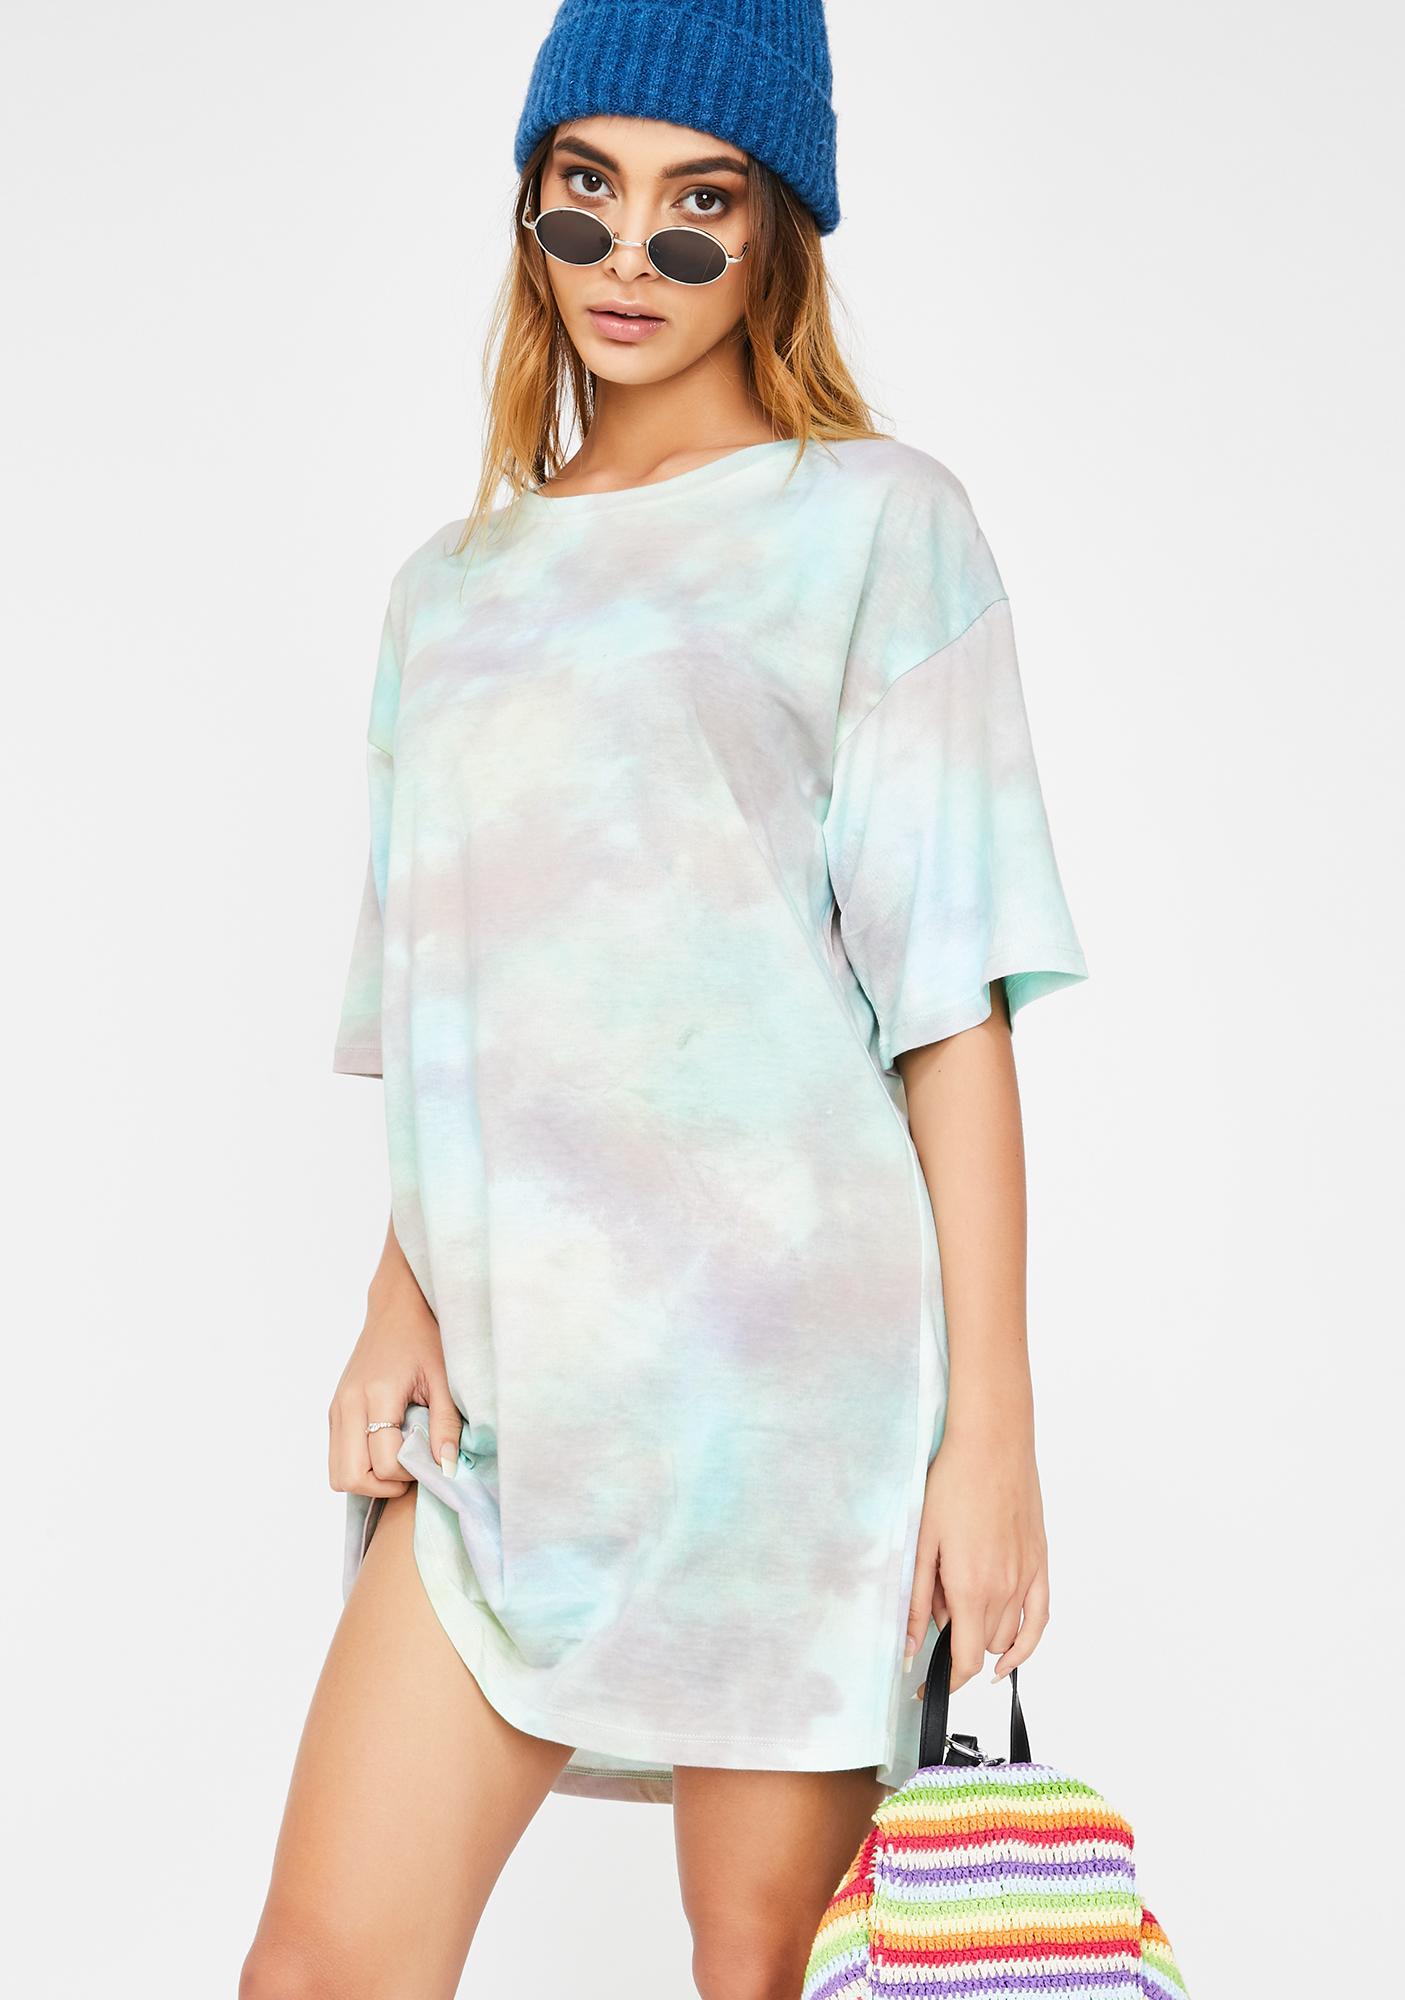 Motel Pastel Tie Dye Sunny Kiss Dress